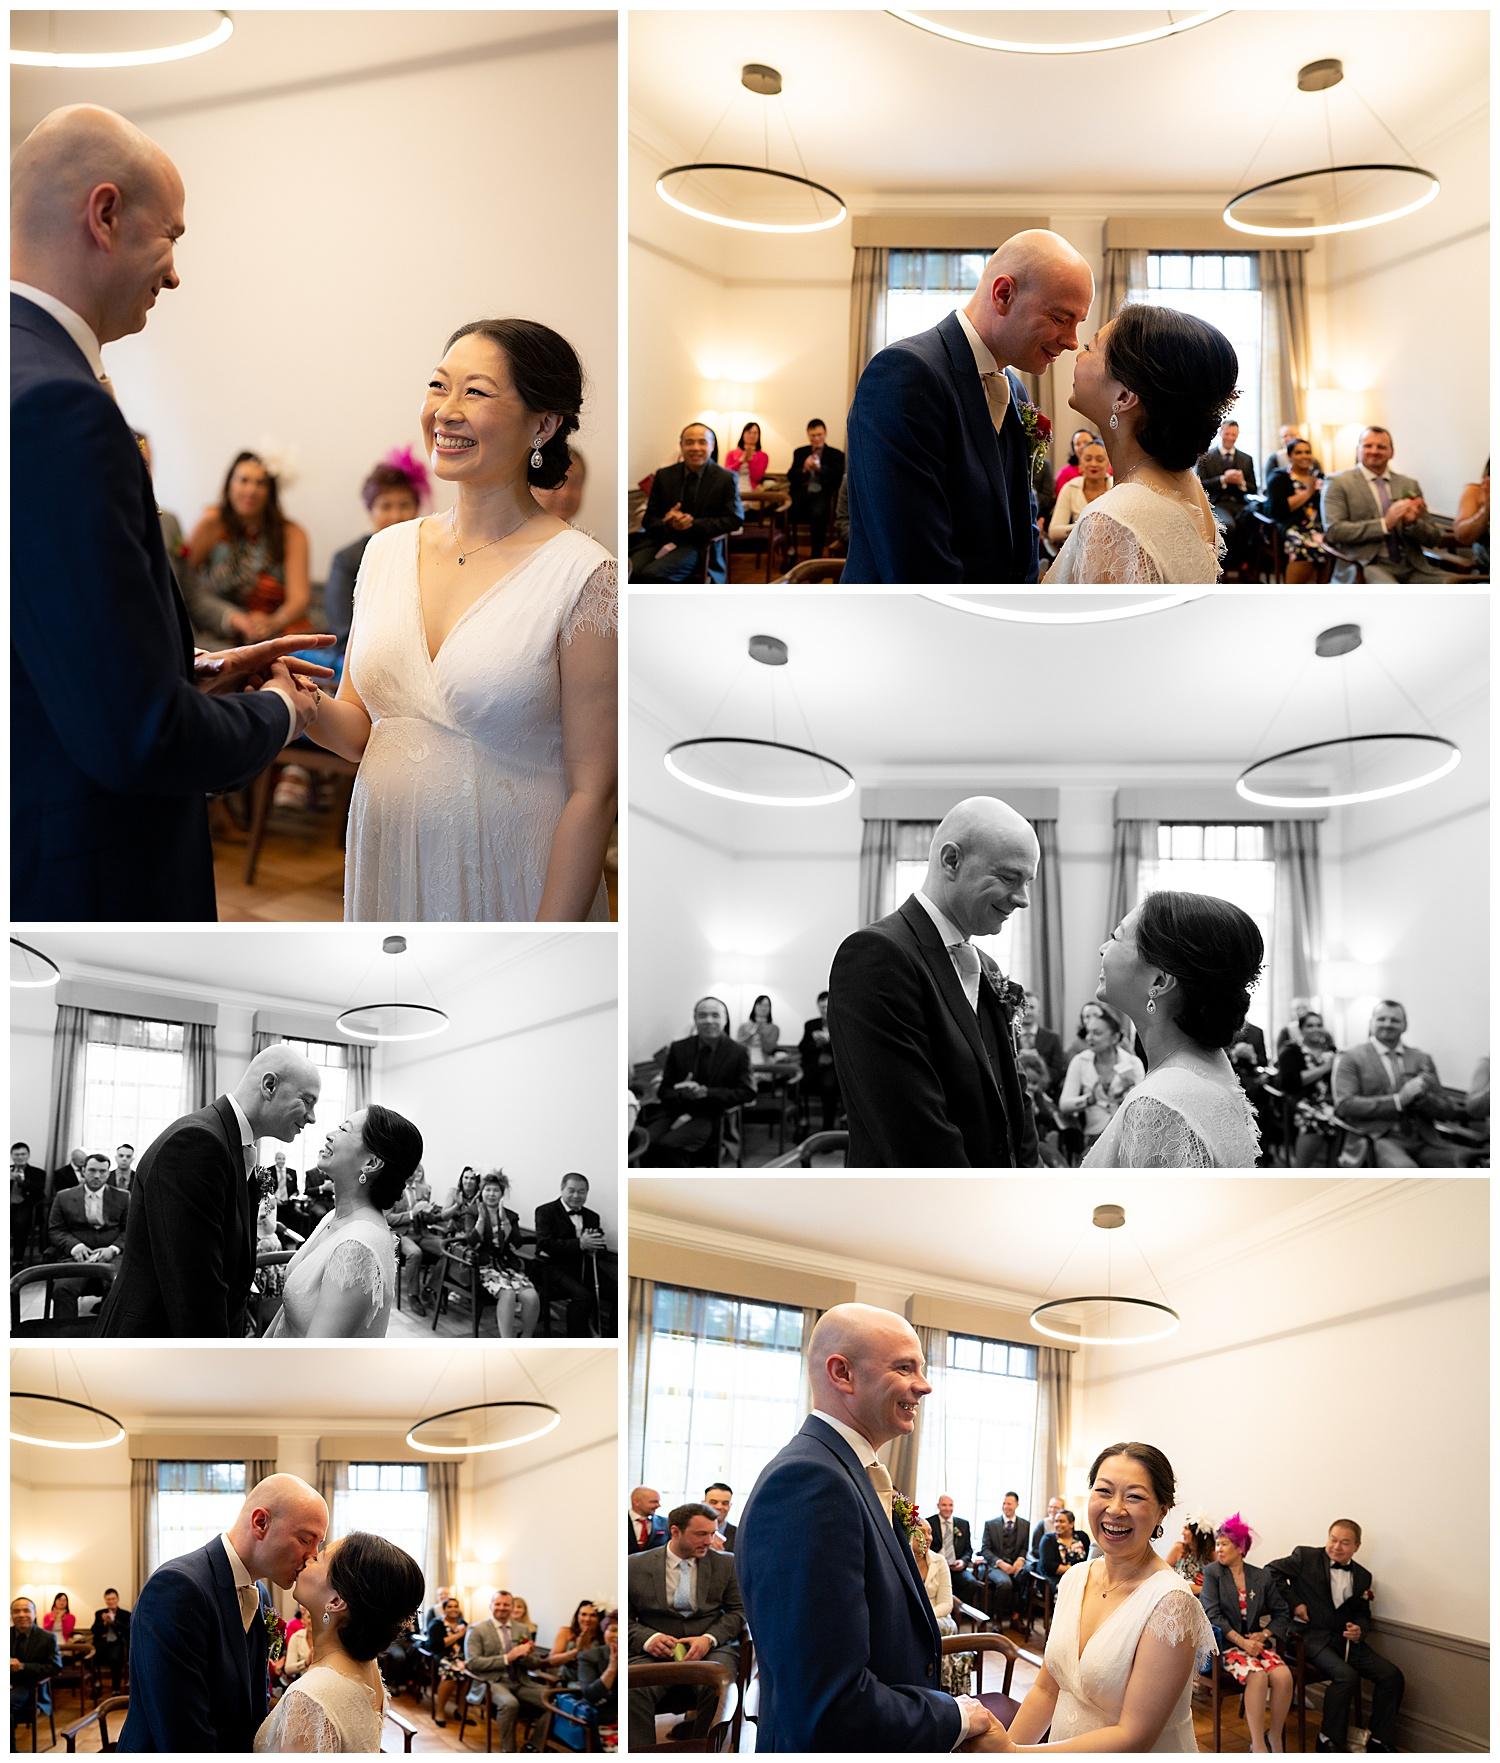 marylebone-town-hall-wedding-16.jpg